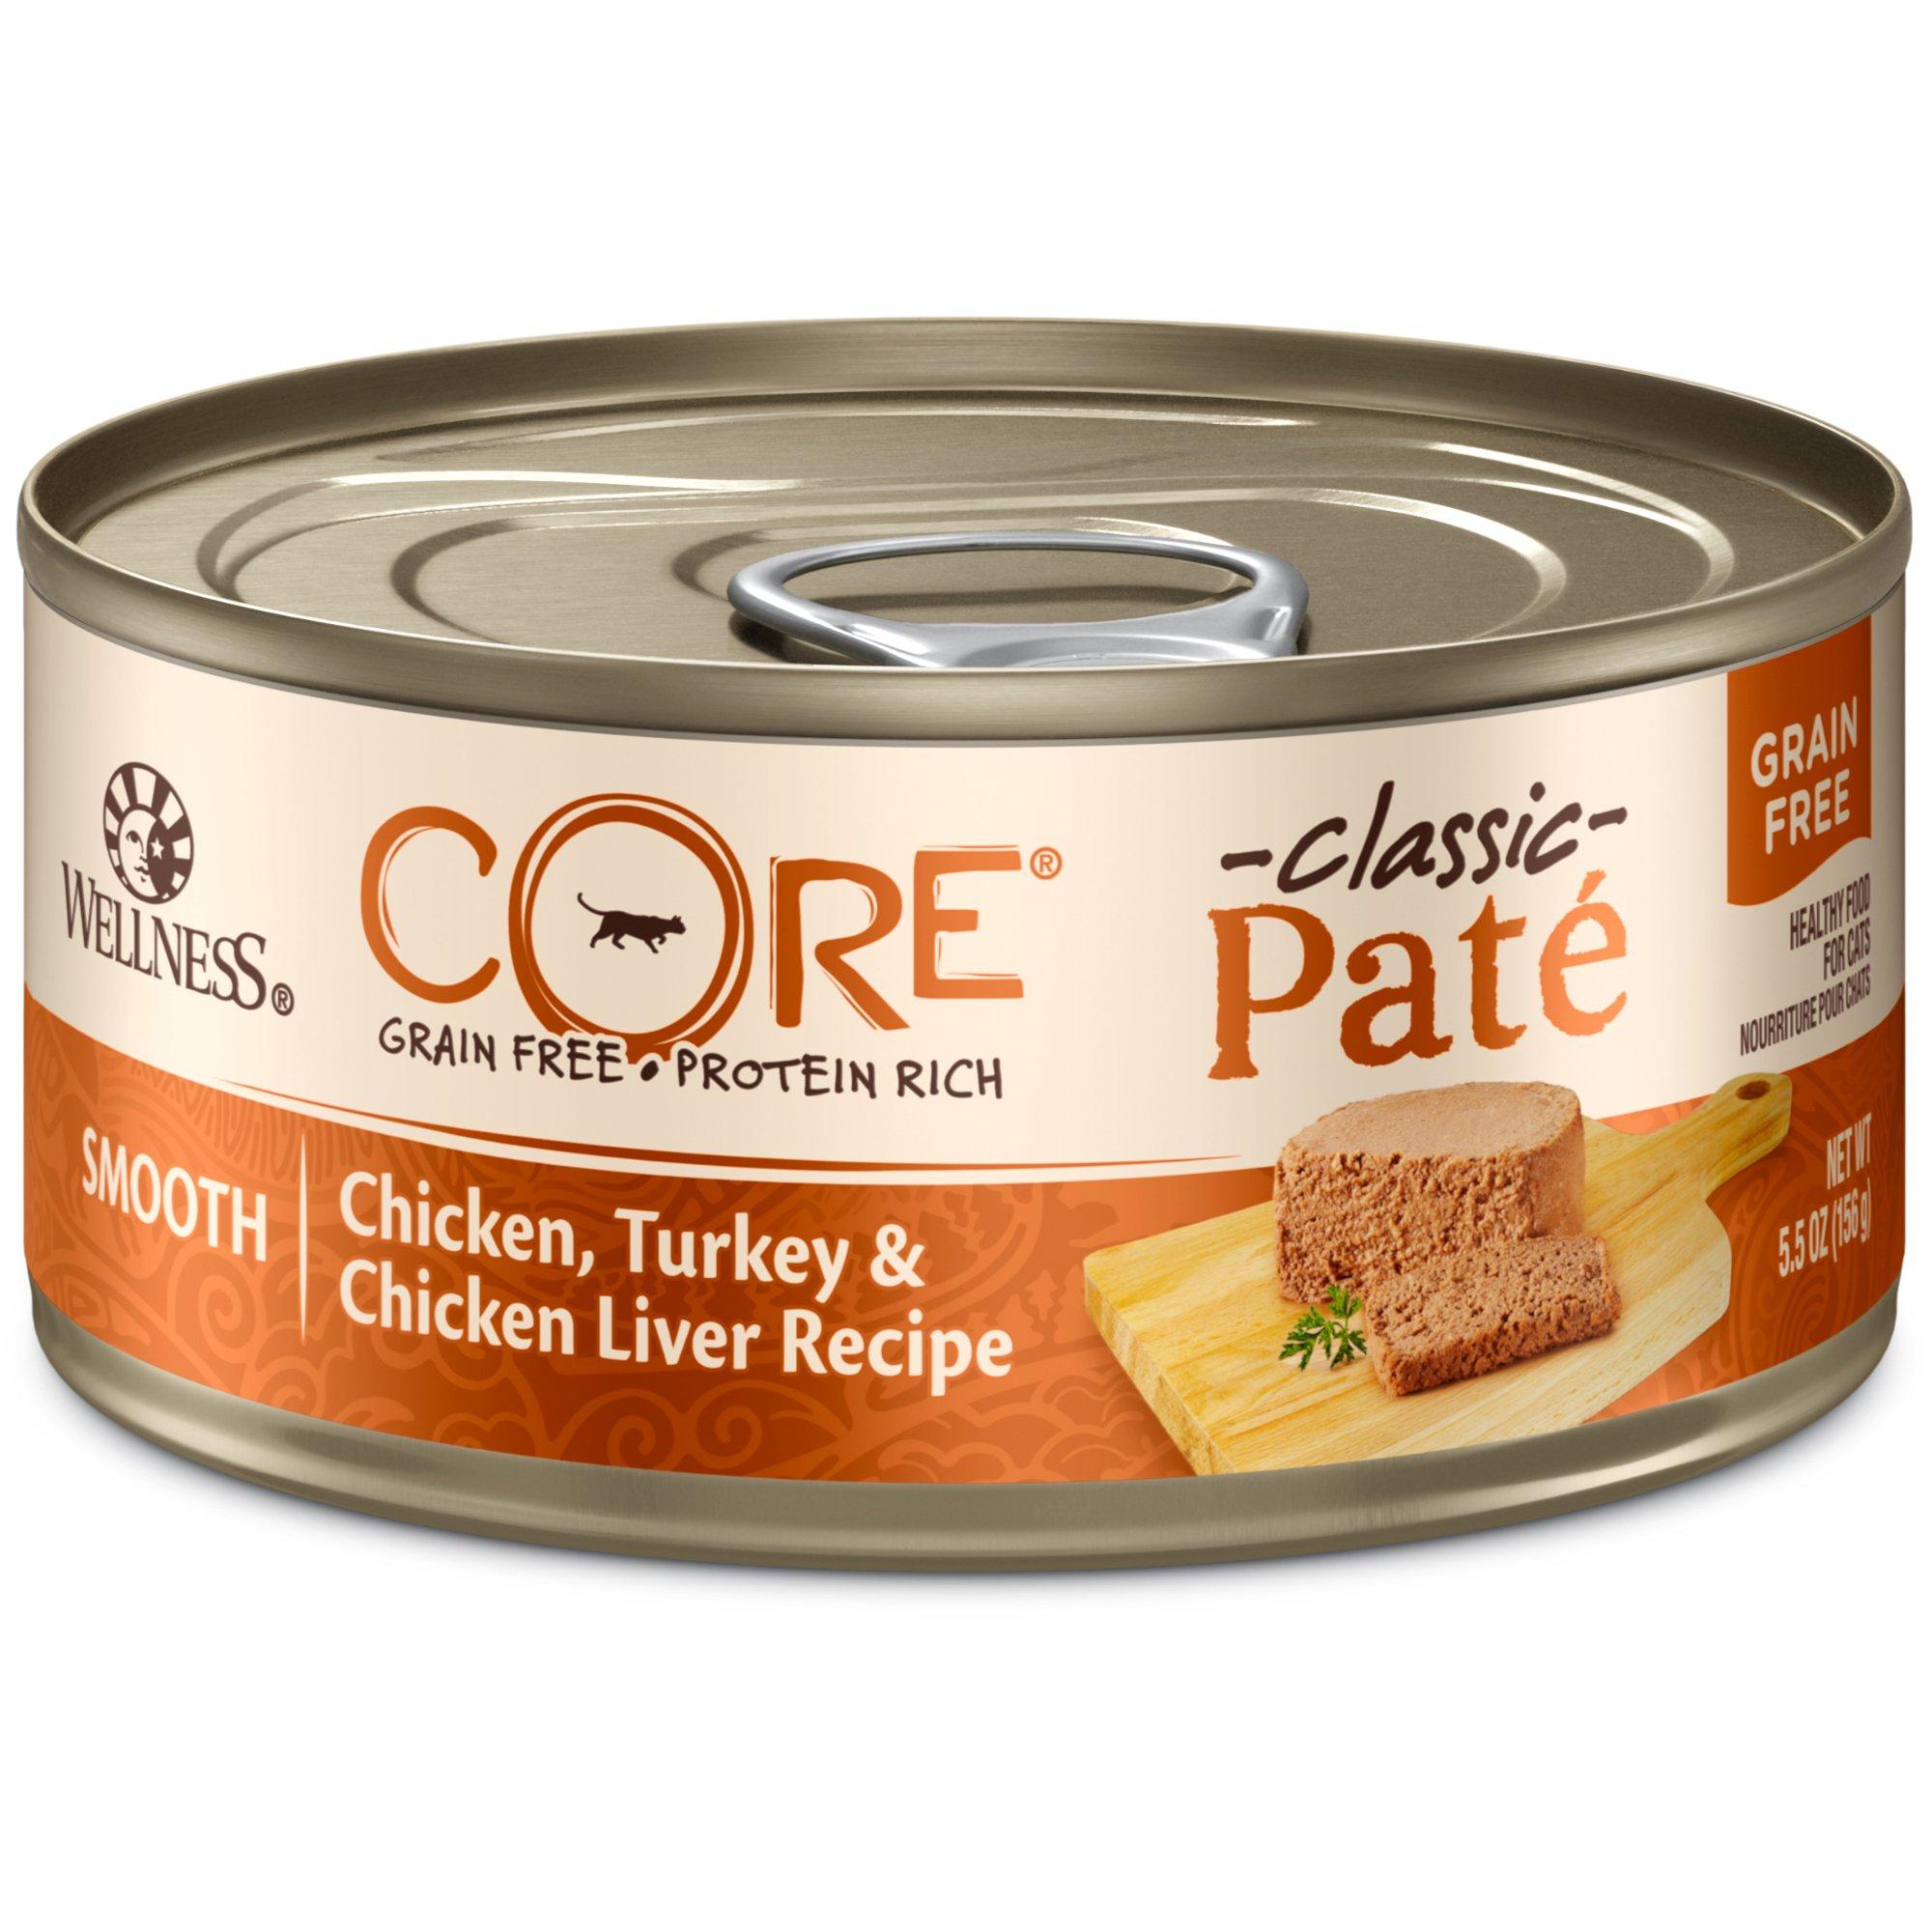 Wellness CORE Chicken, Turkey & Chicken Liver Canned Cat Food